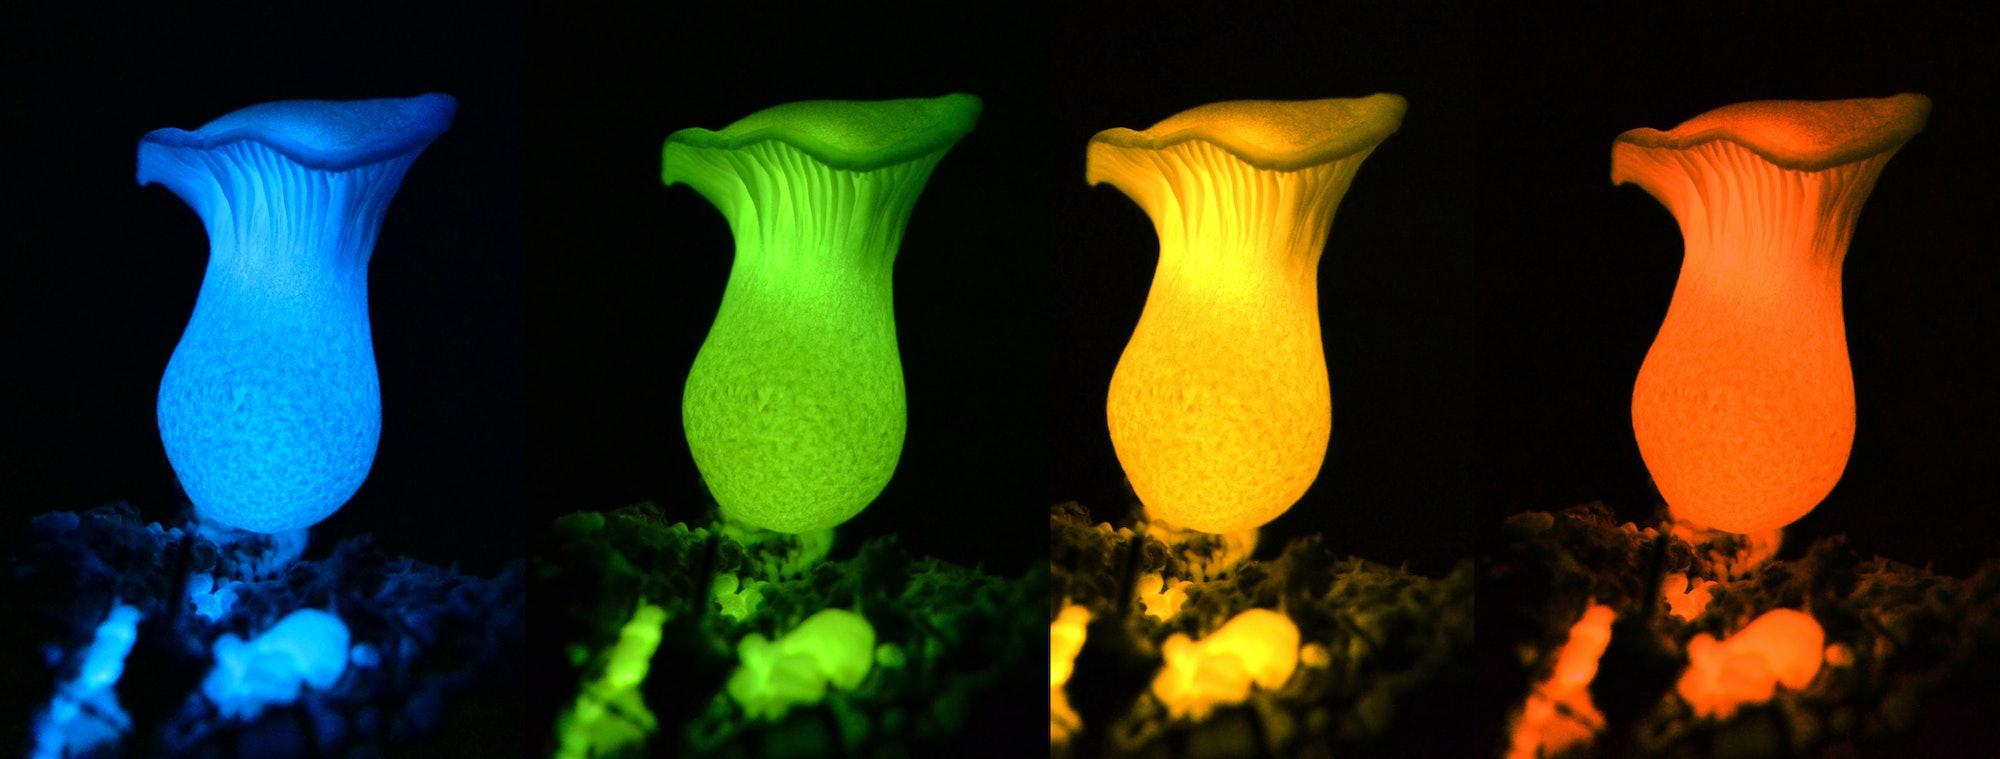 four colored mushrooms